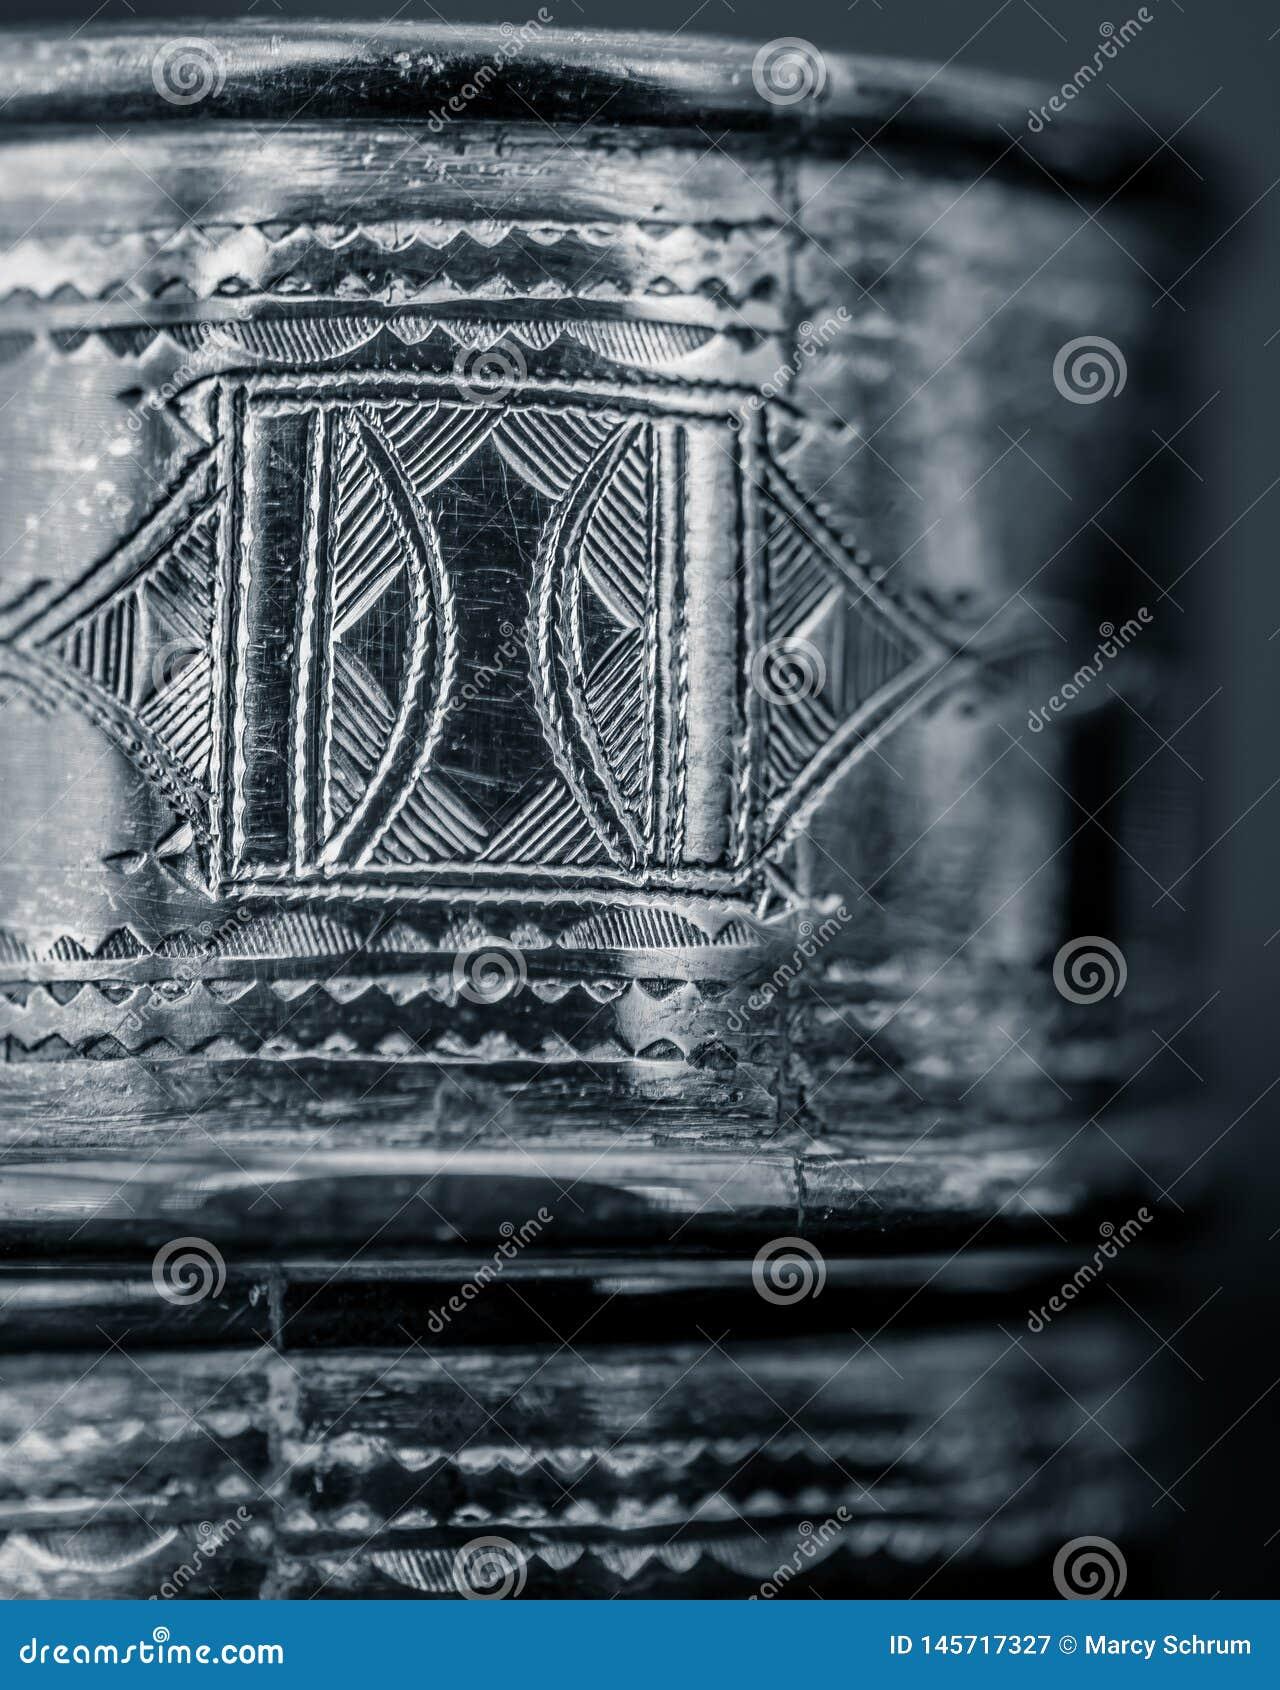 Tuareg Silver Engraving Detailed Close-up